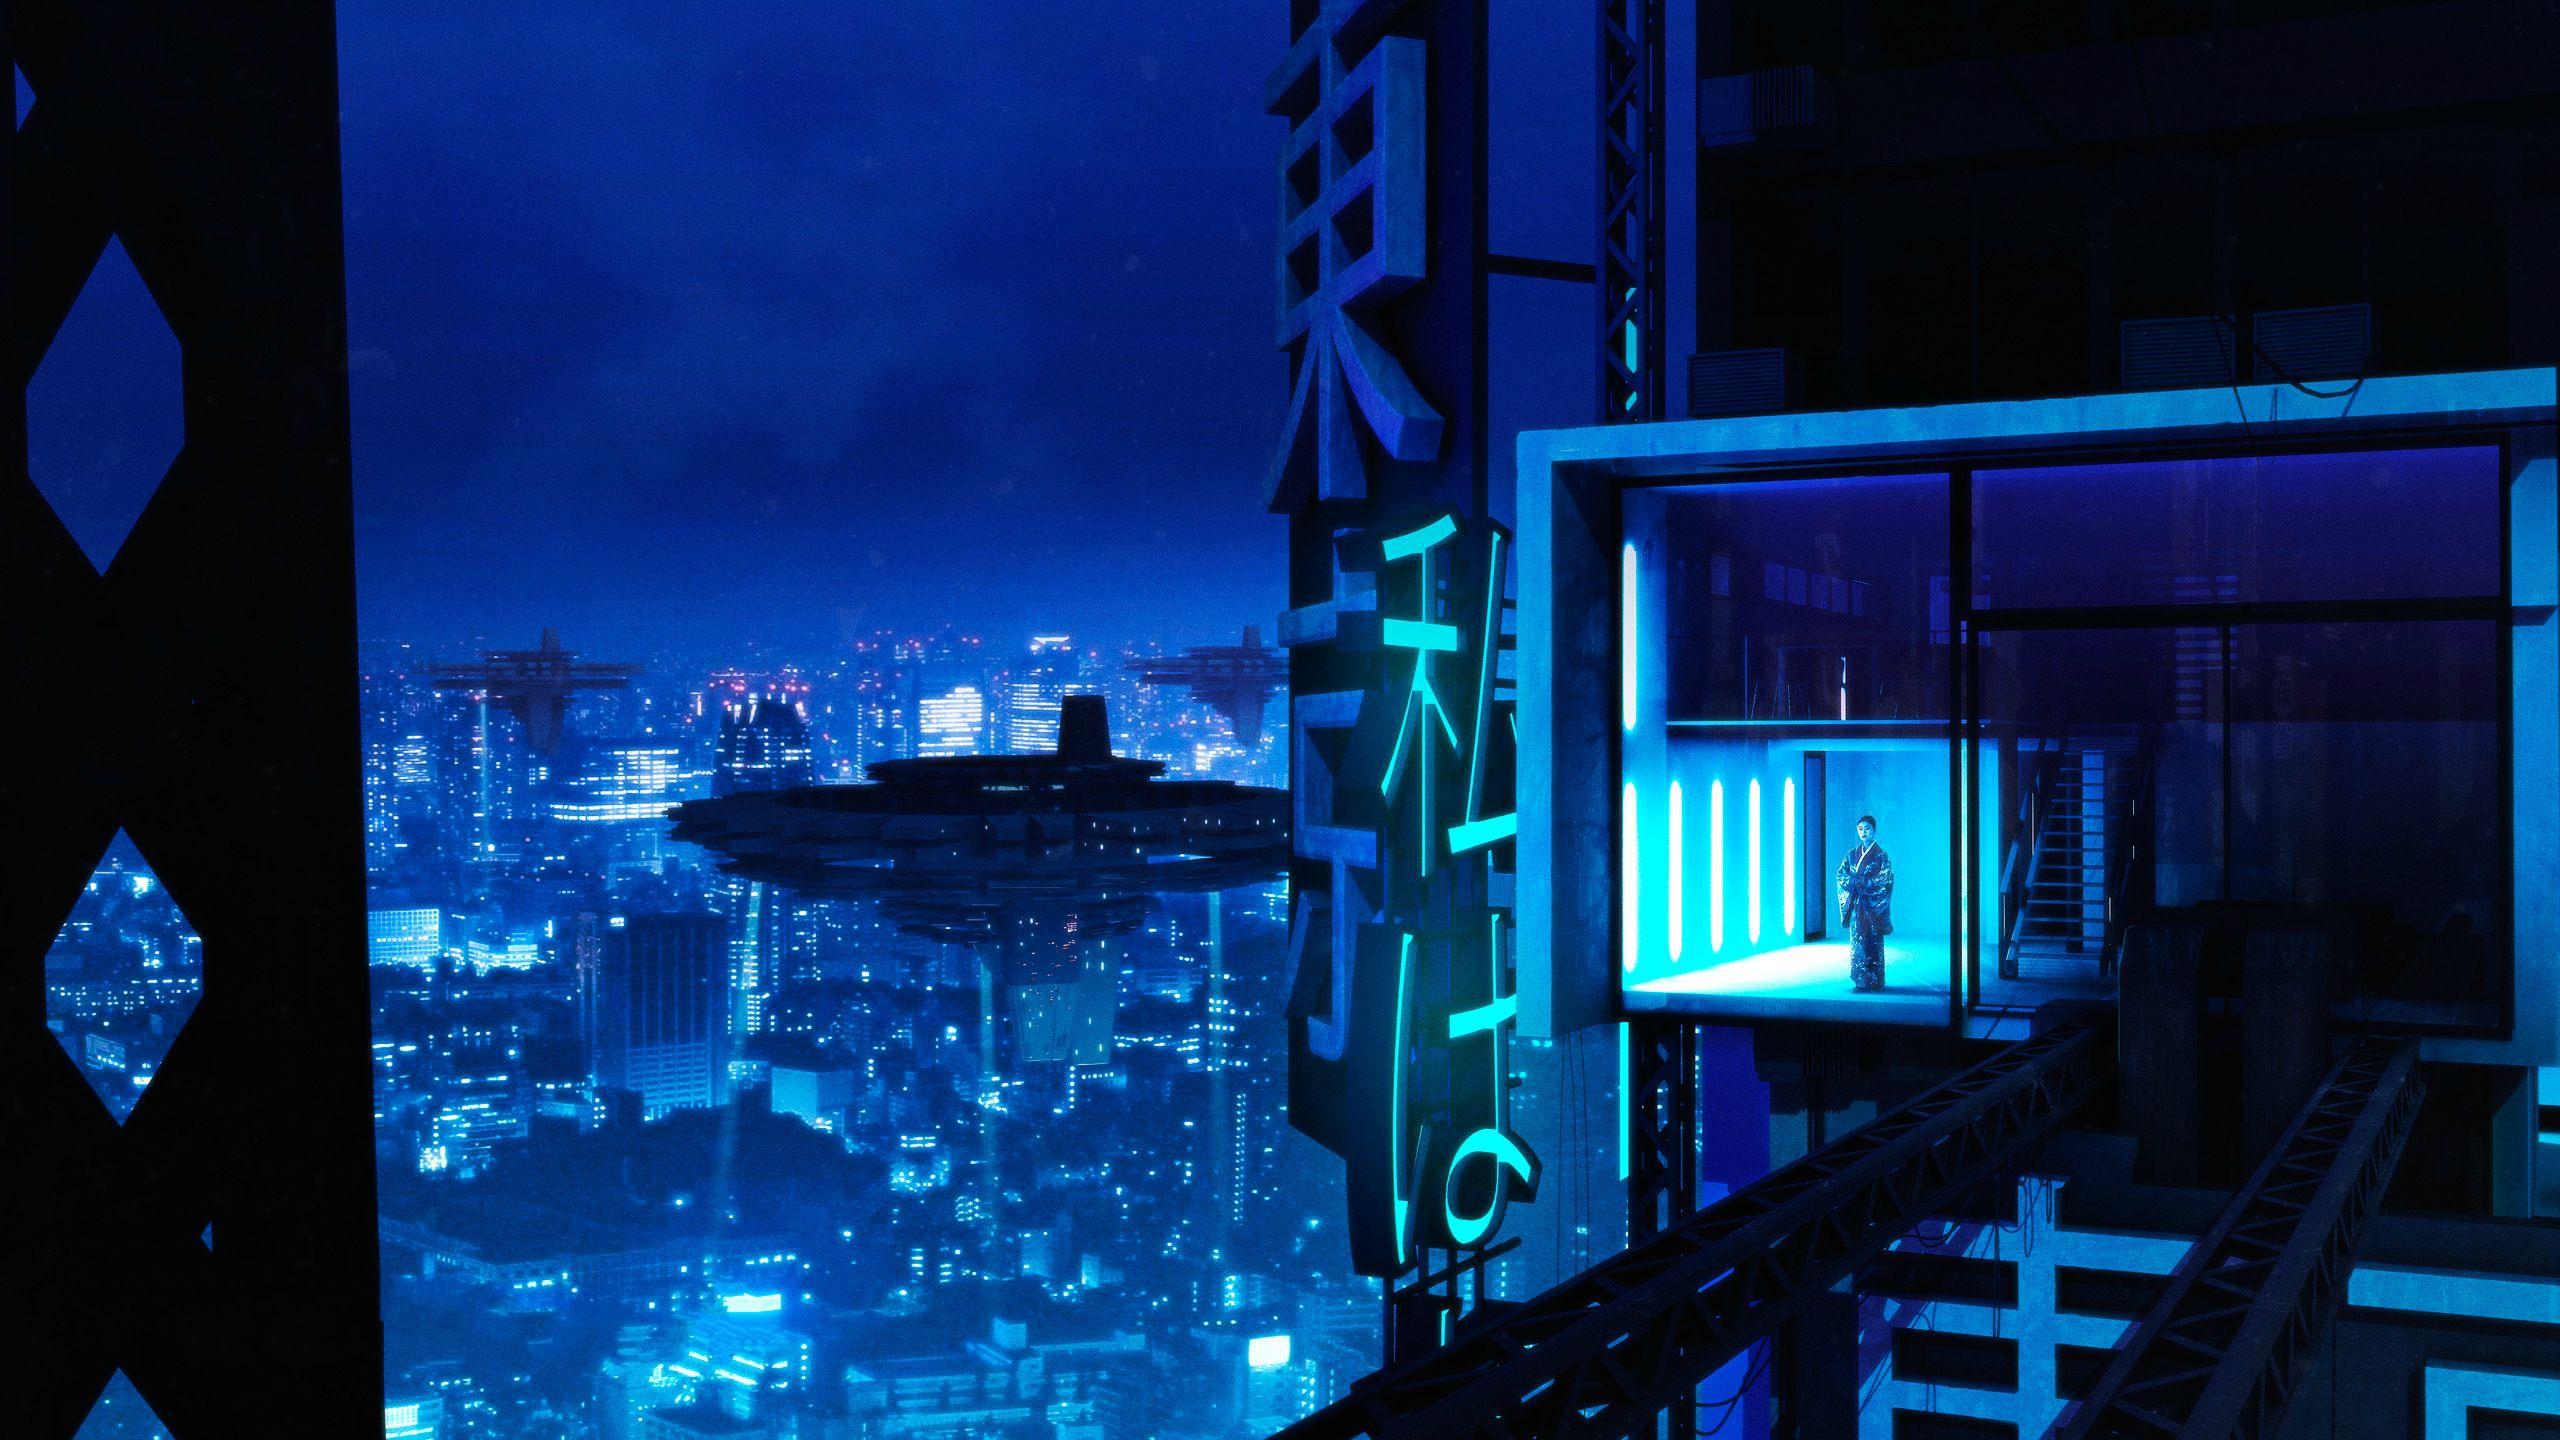 HD Cyberpunk Wallpapers 2560x1440